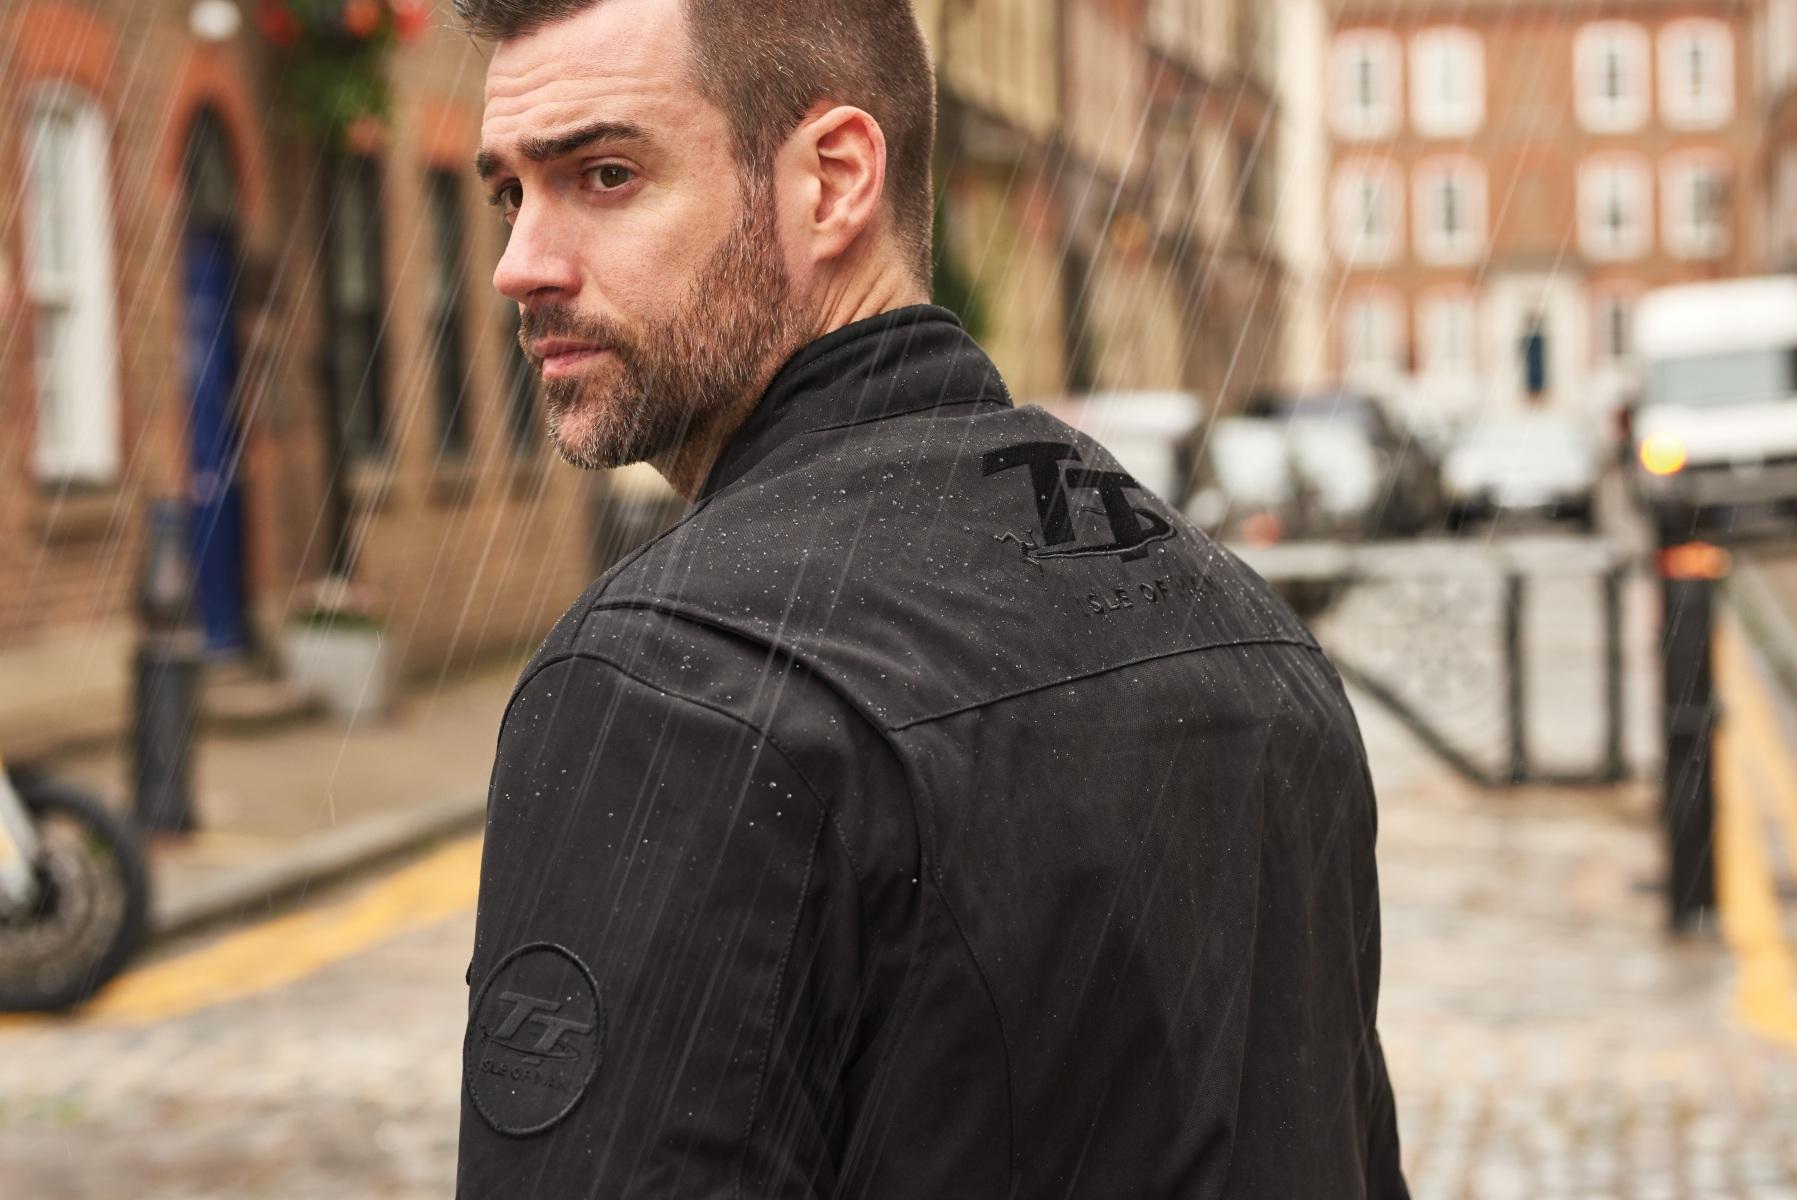 102296-rst-iom-tt-crosby-jacket-black-lifestyle-02